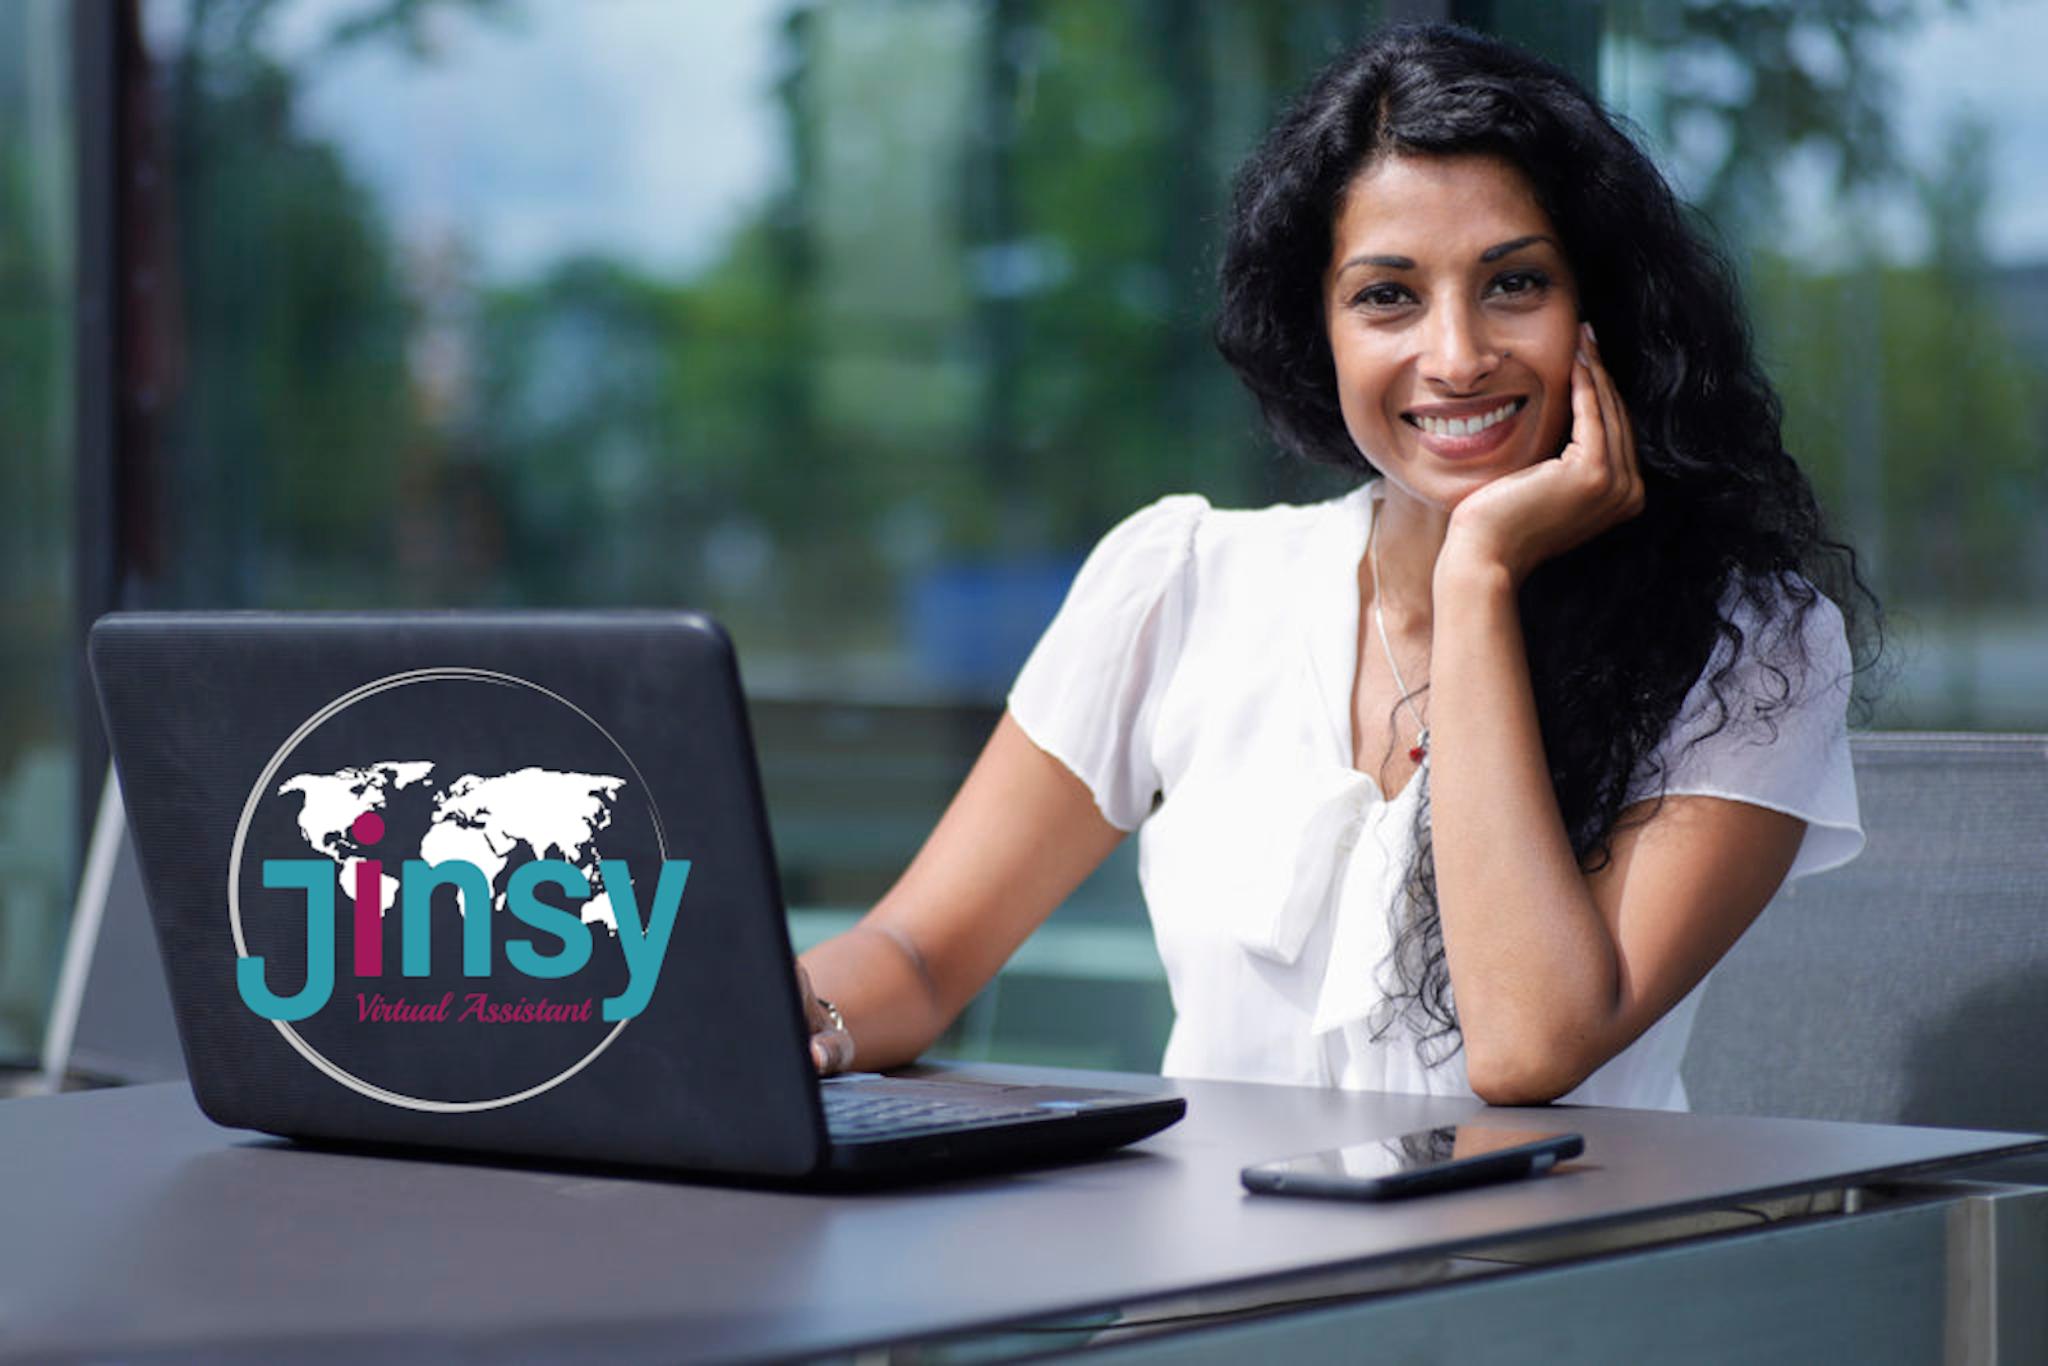 Jinsy Charuvuparambil Virtuelle Assistenz